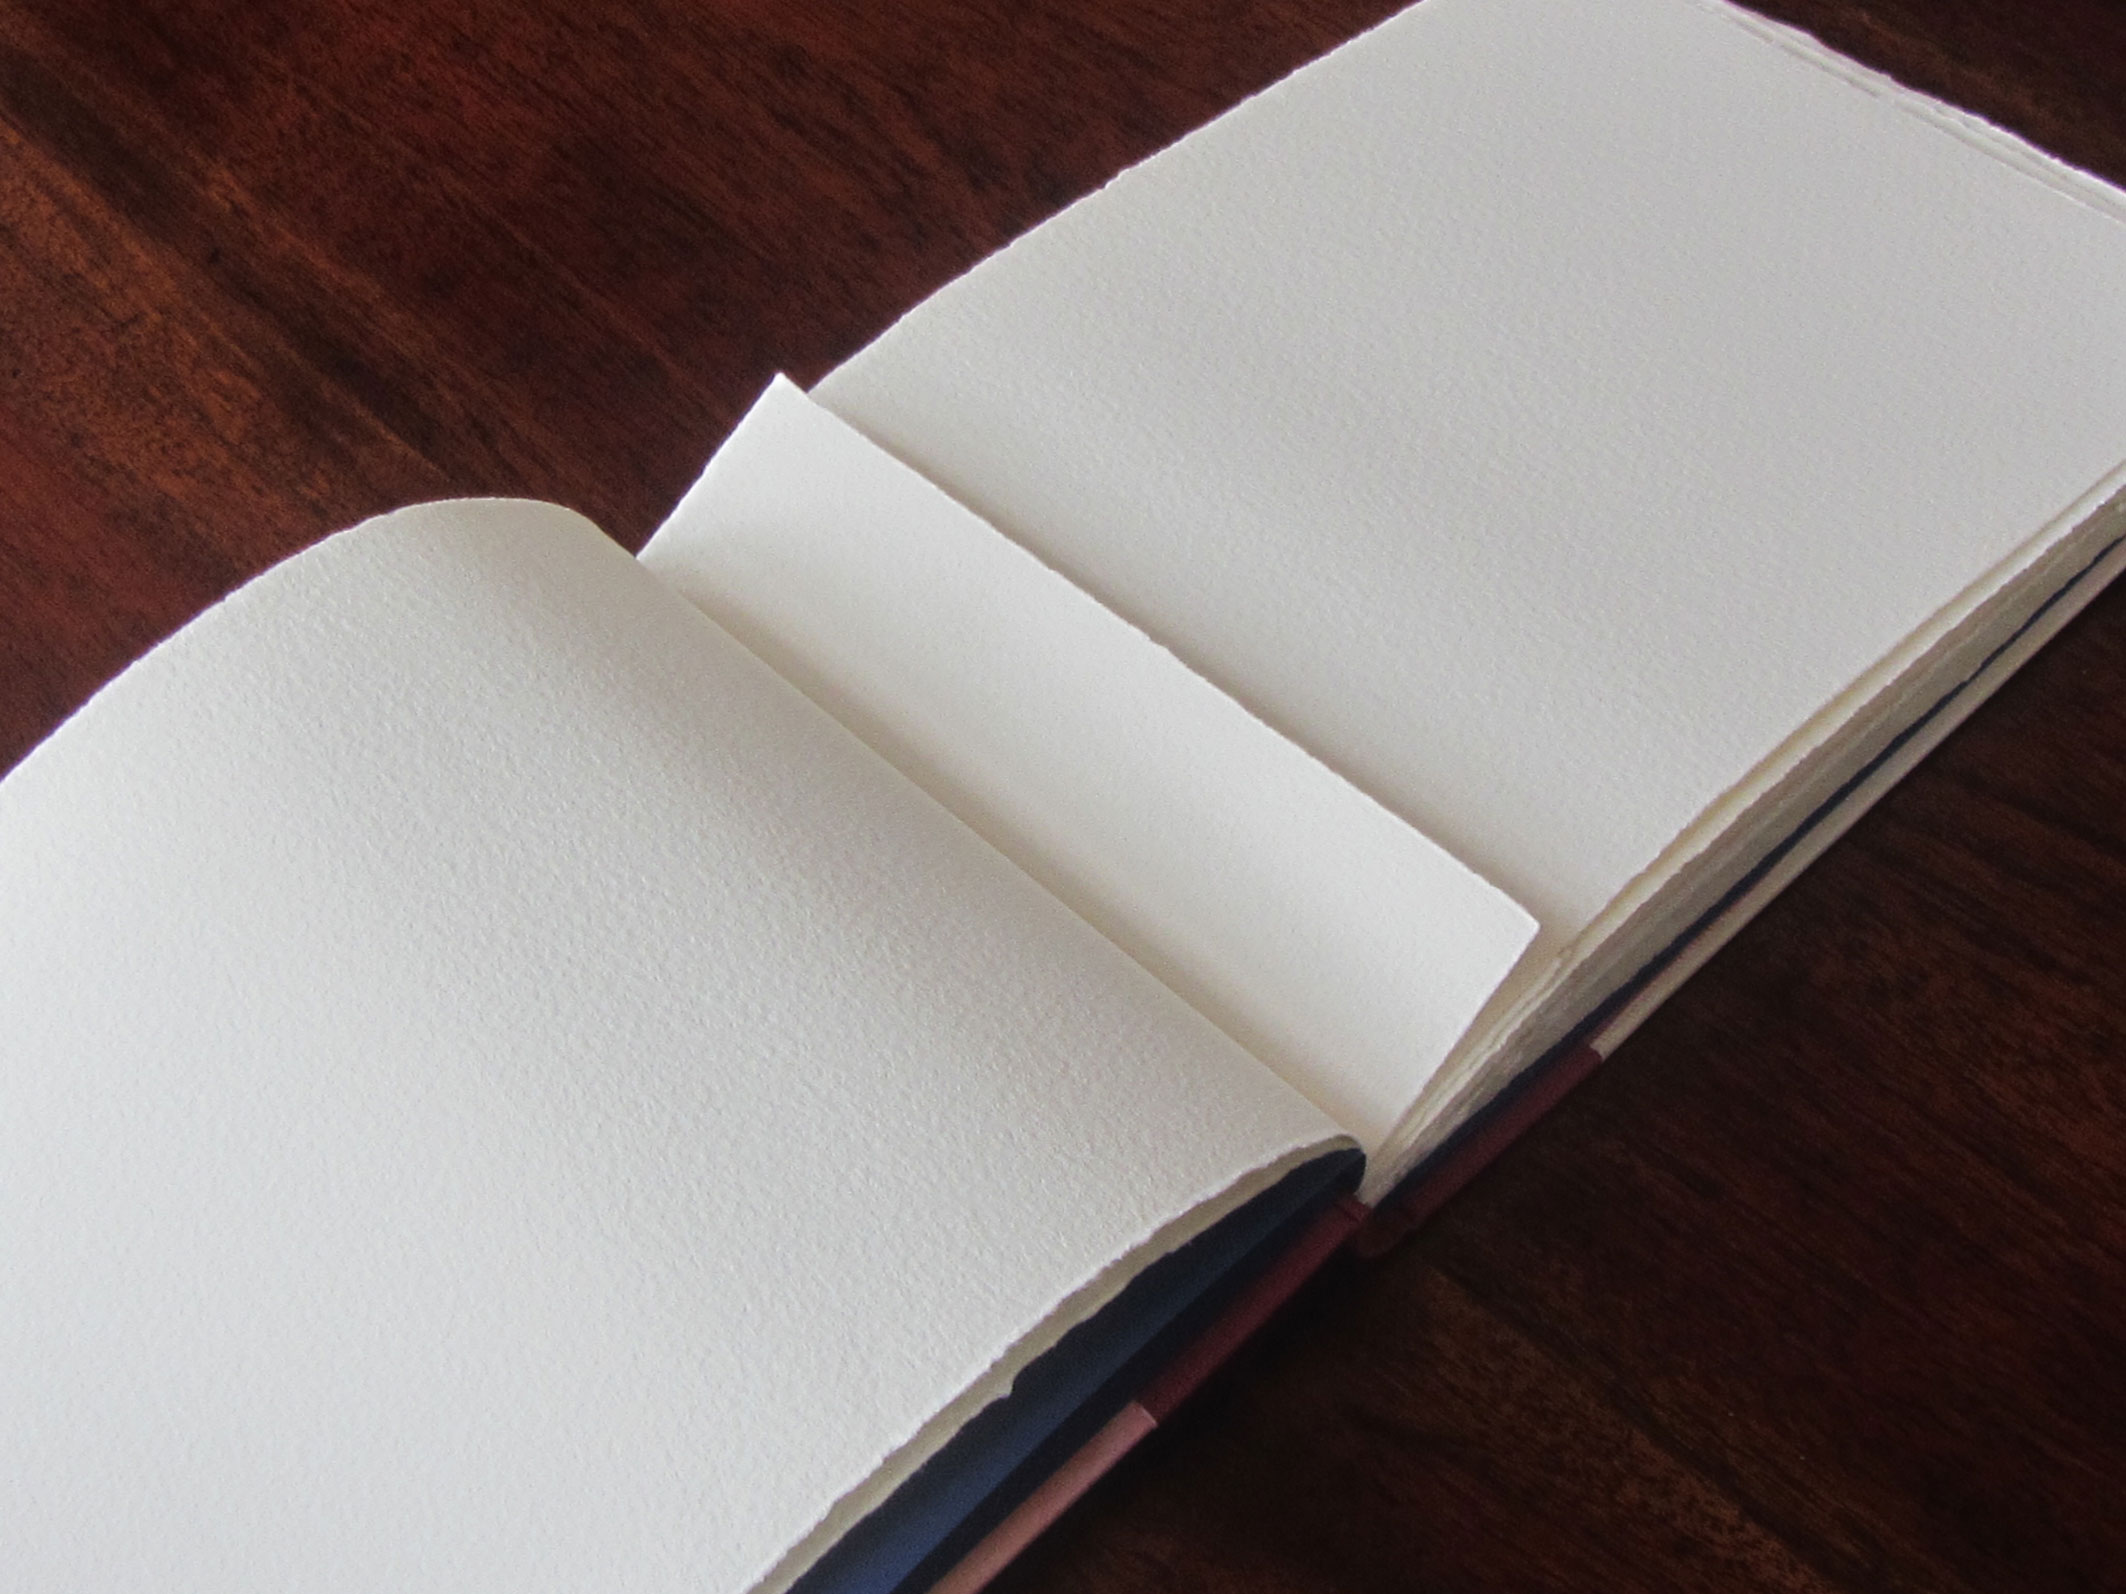 Thankgiving-book-open-binding-WEB.jpg